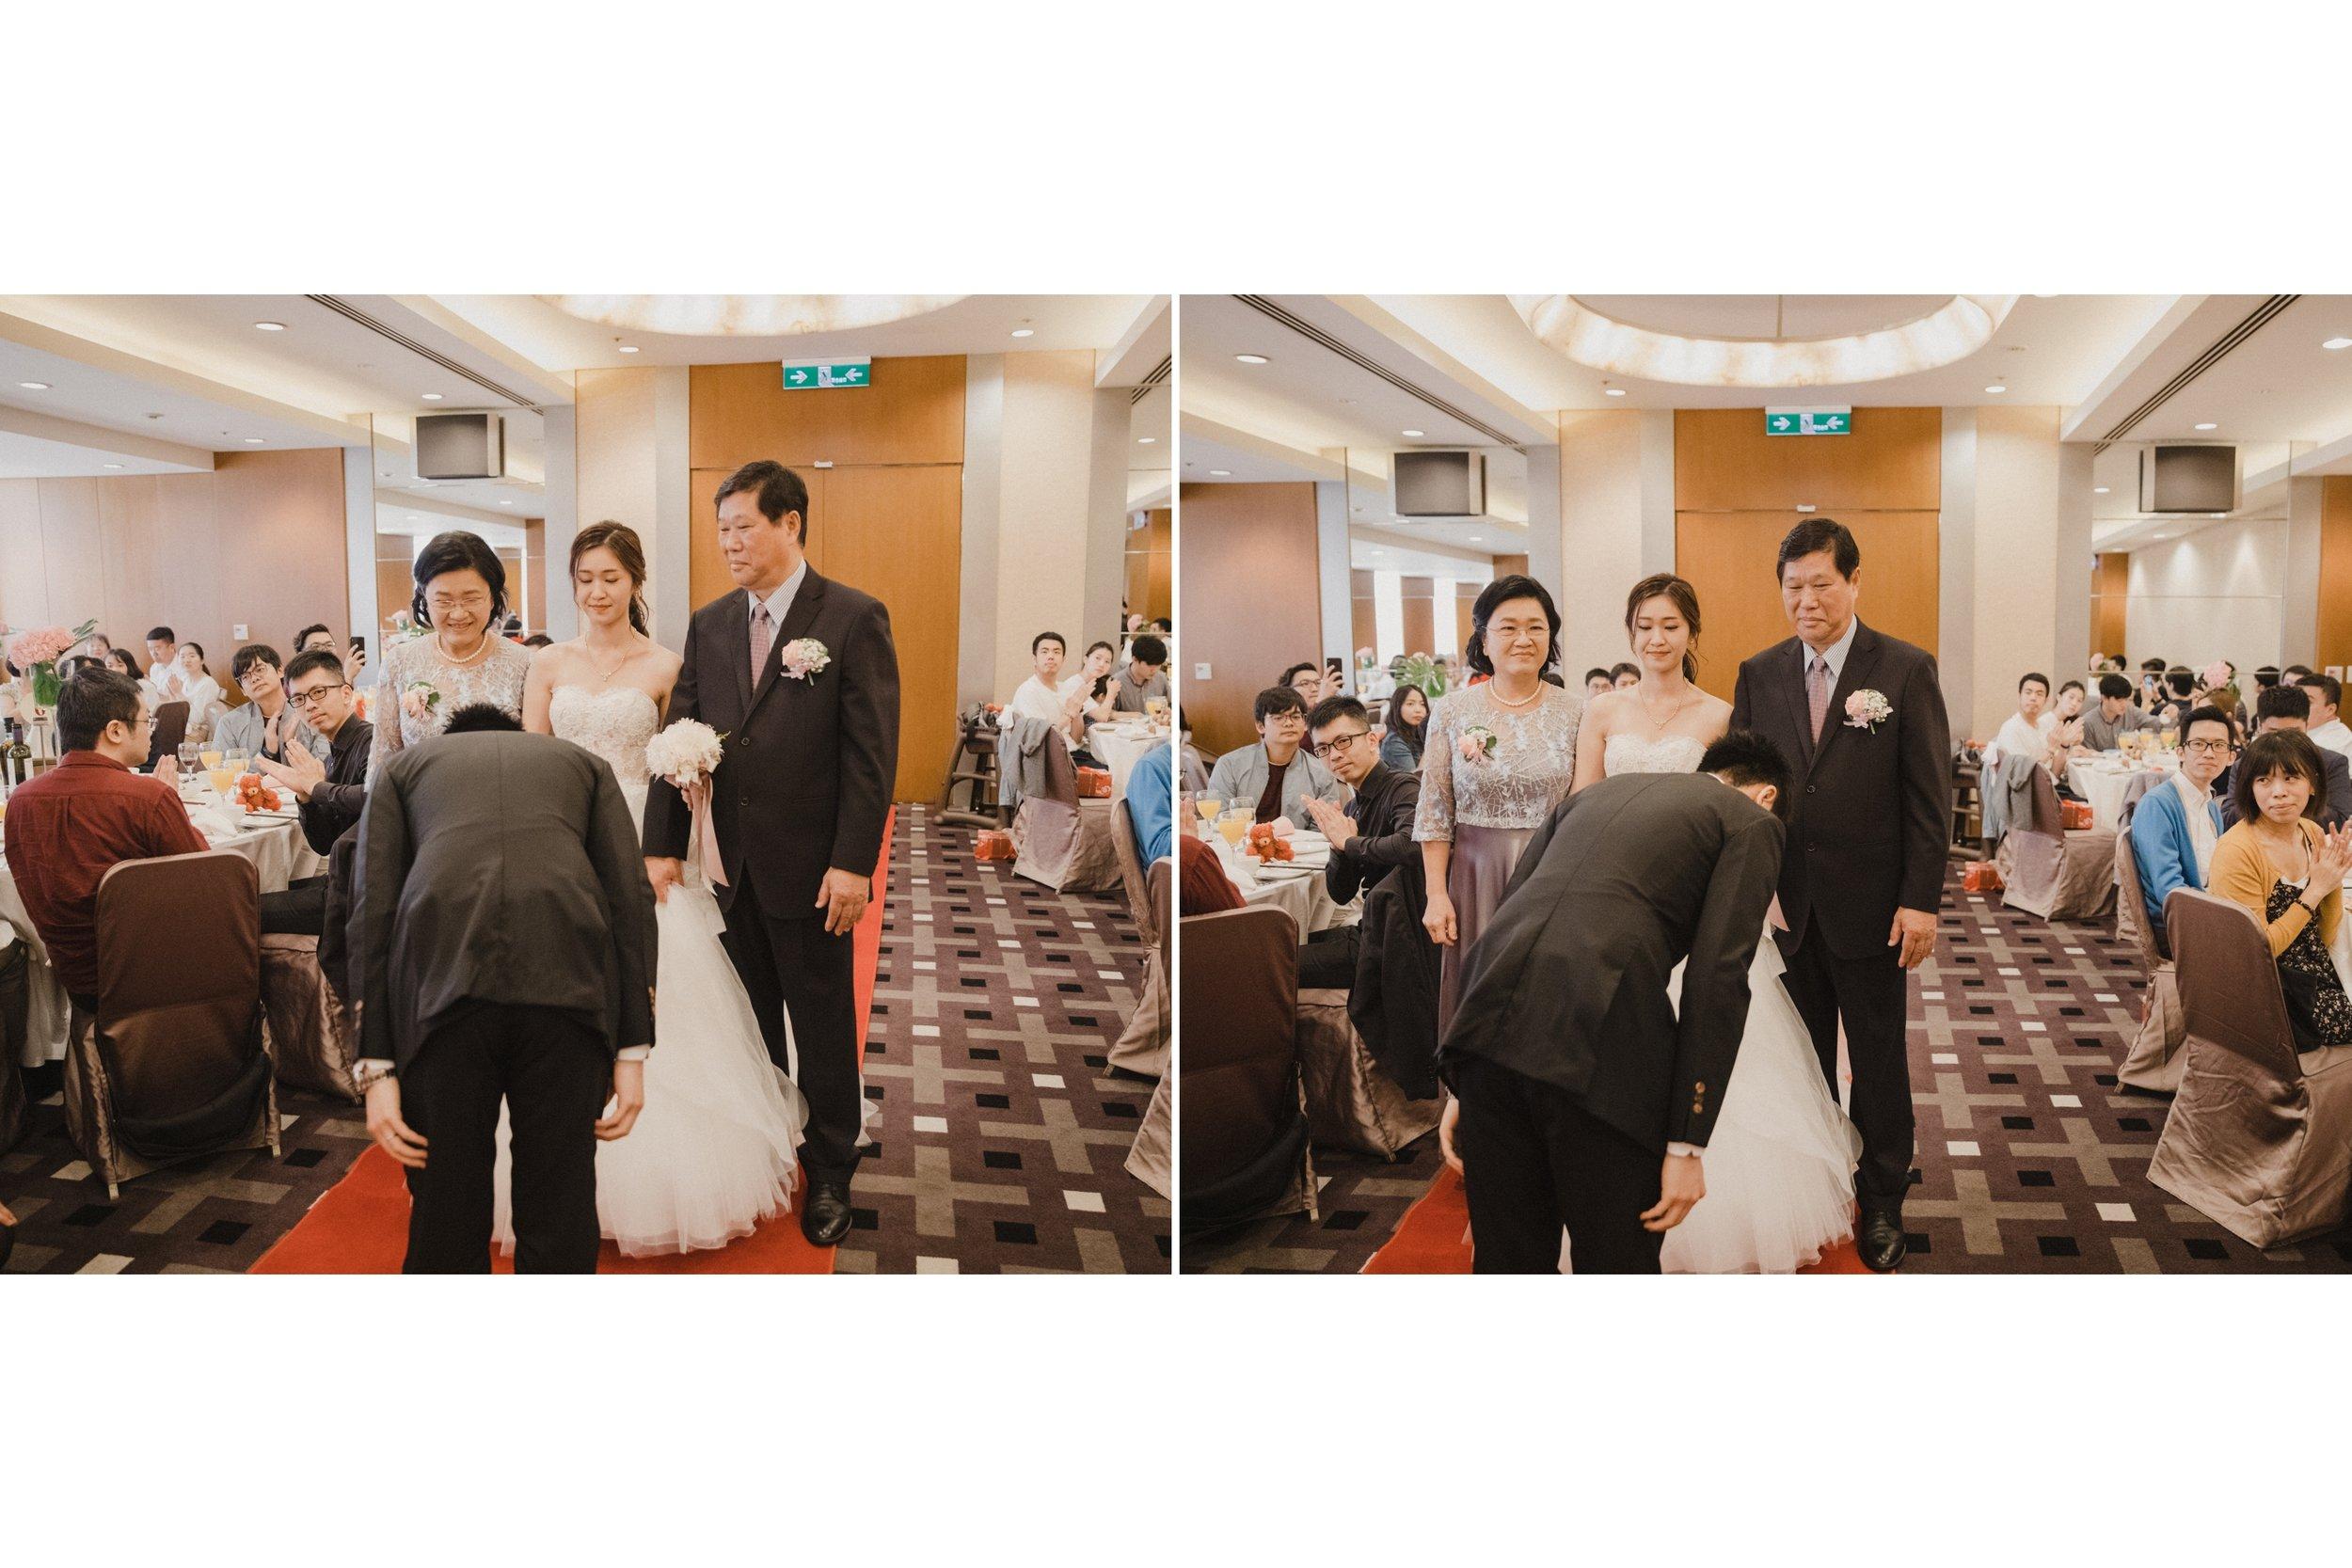 wedding-caridee-oscar-lunch-ambassador-hsinchu-結婚午宴-新竹國賓_66.jpg